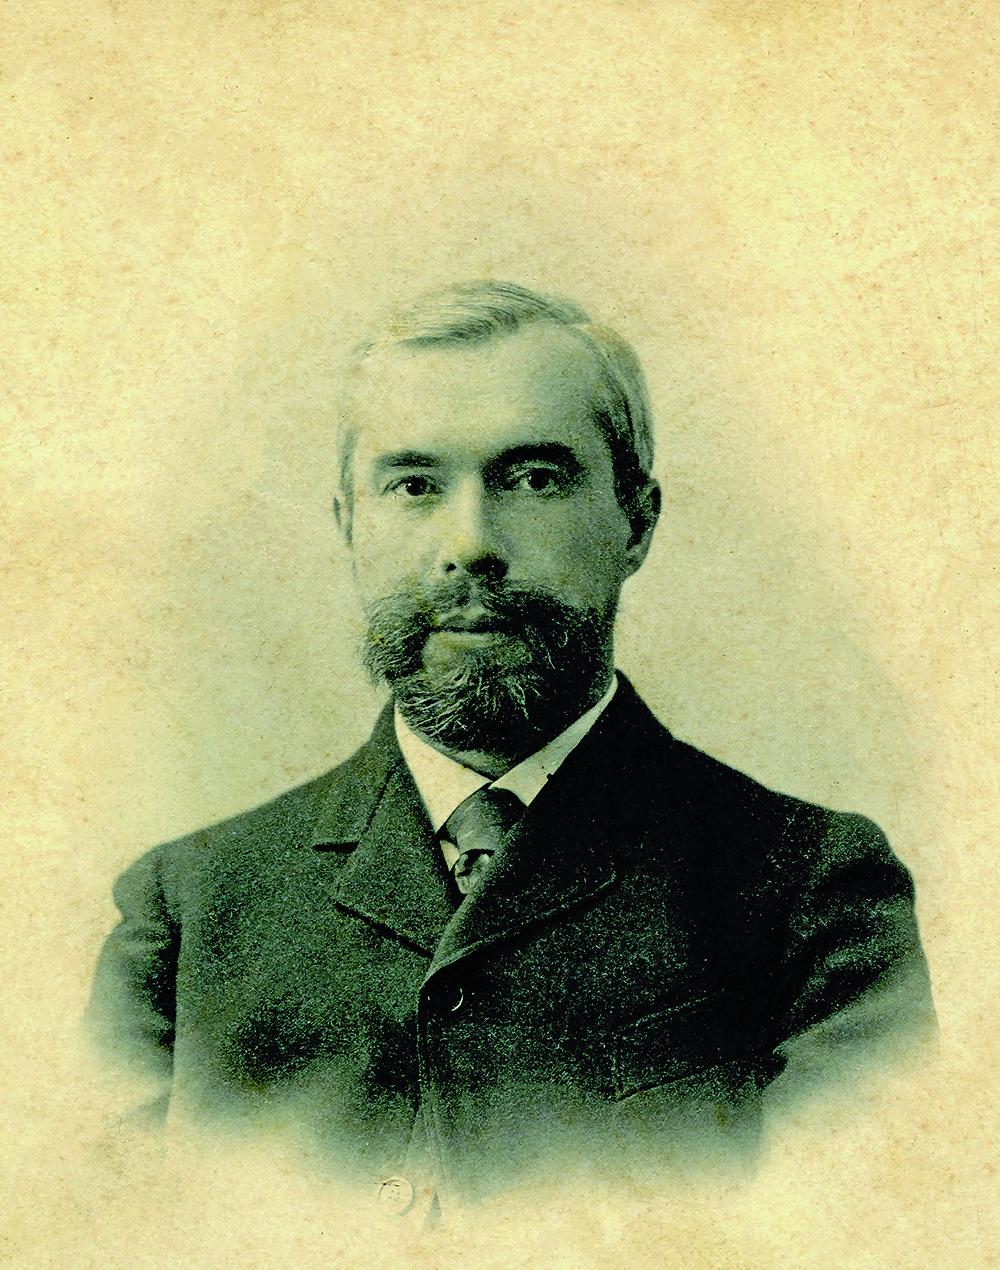 Photograph of Sergei Shchukin, c. 1890. Courtesy of Collection Chtchoukine.